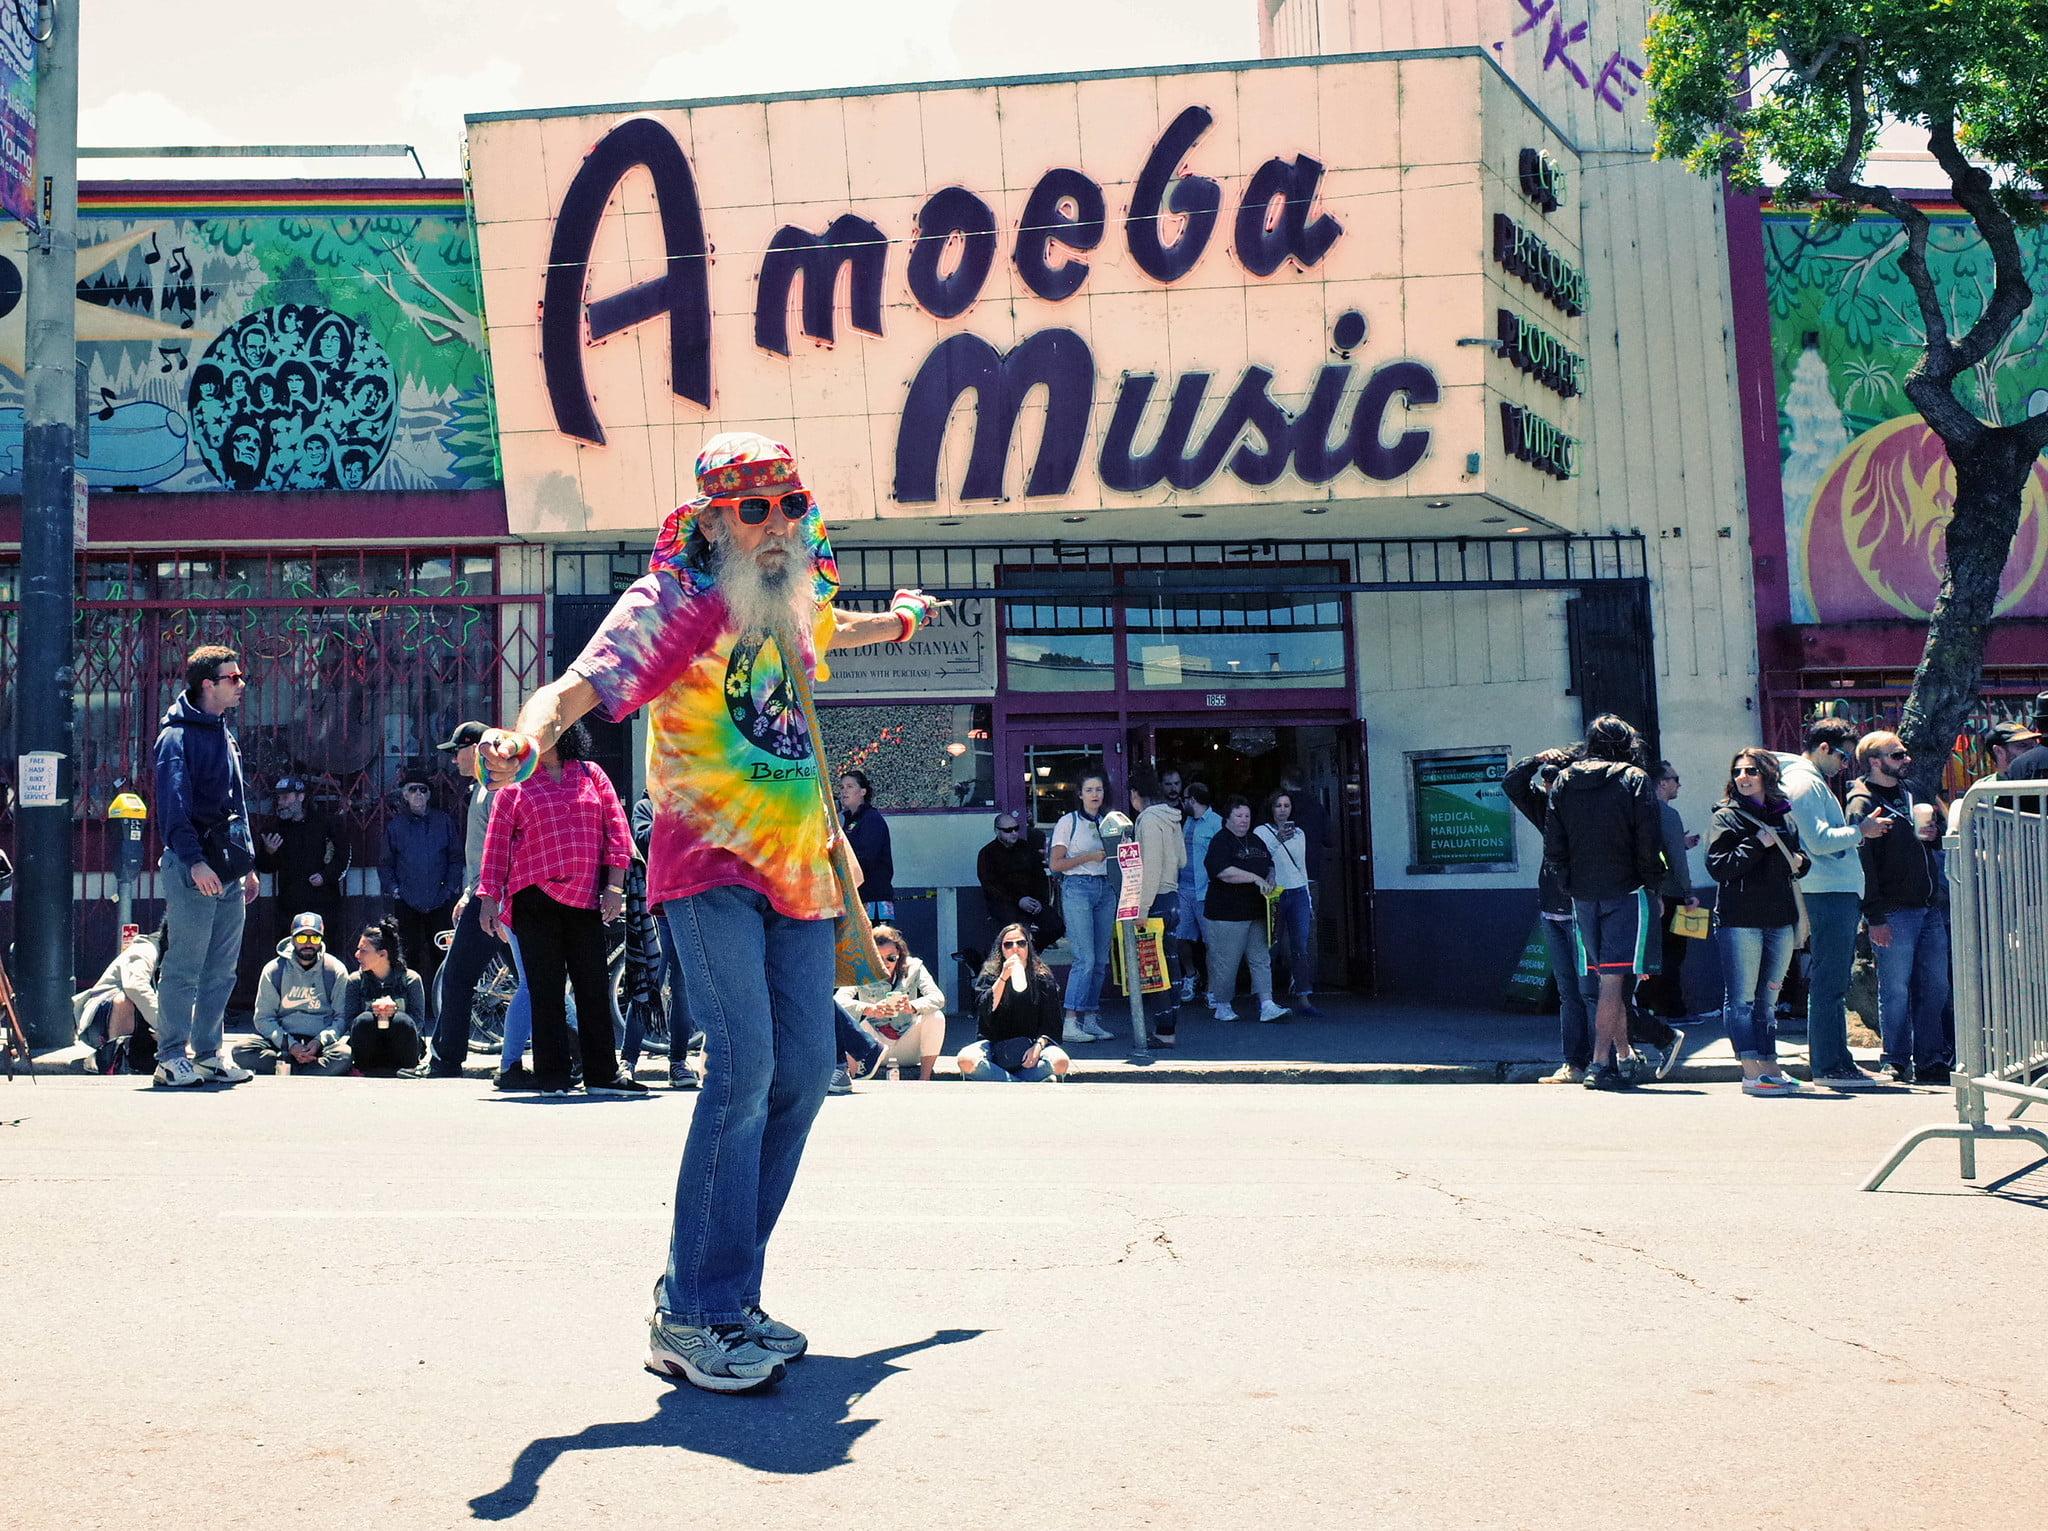 Amoeba Music on Haight Street - photo by Kathy Drasky under CC BY 2.0